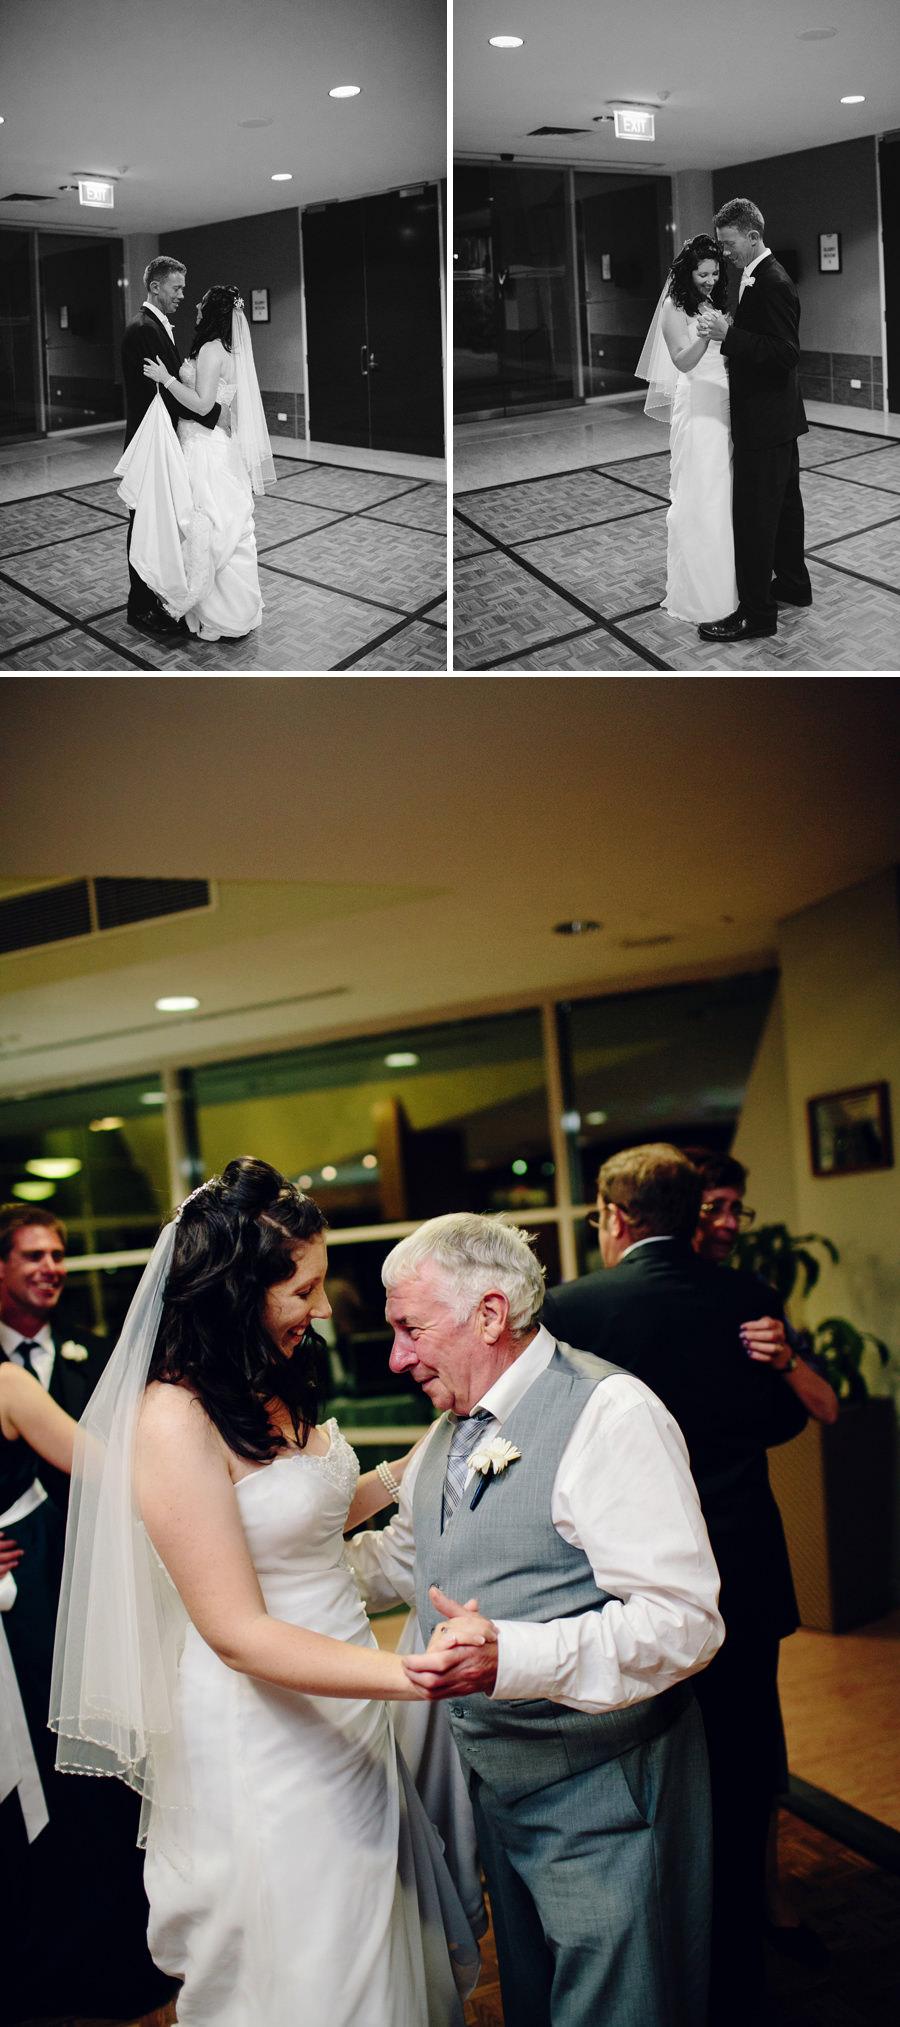 Modern Wedding Photographer: Bridal waltz